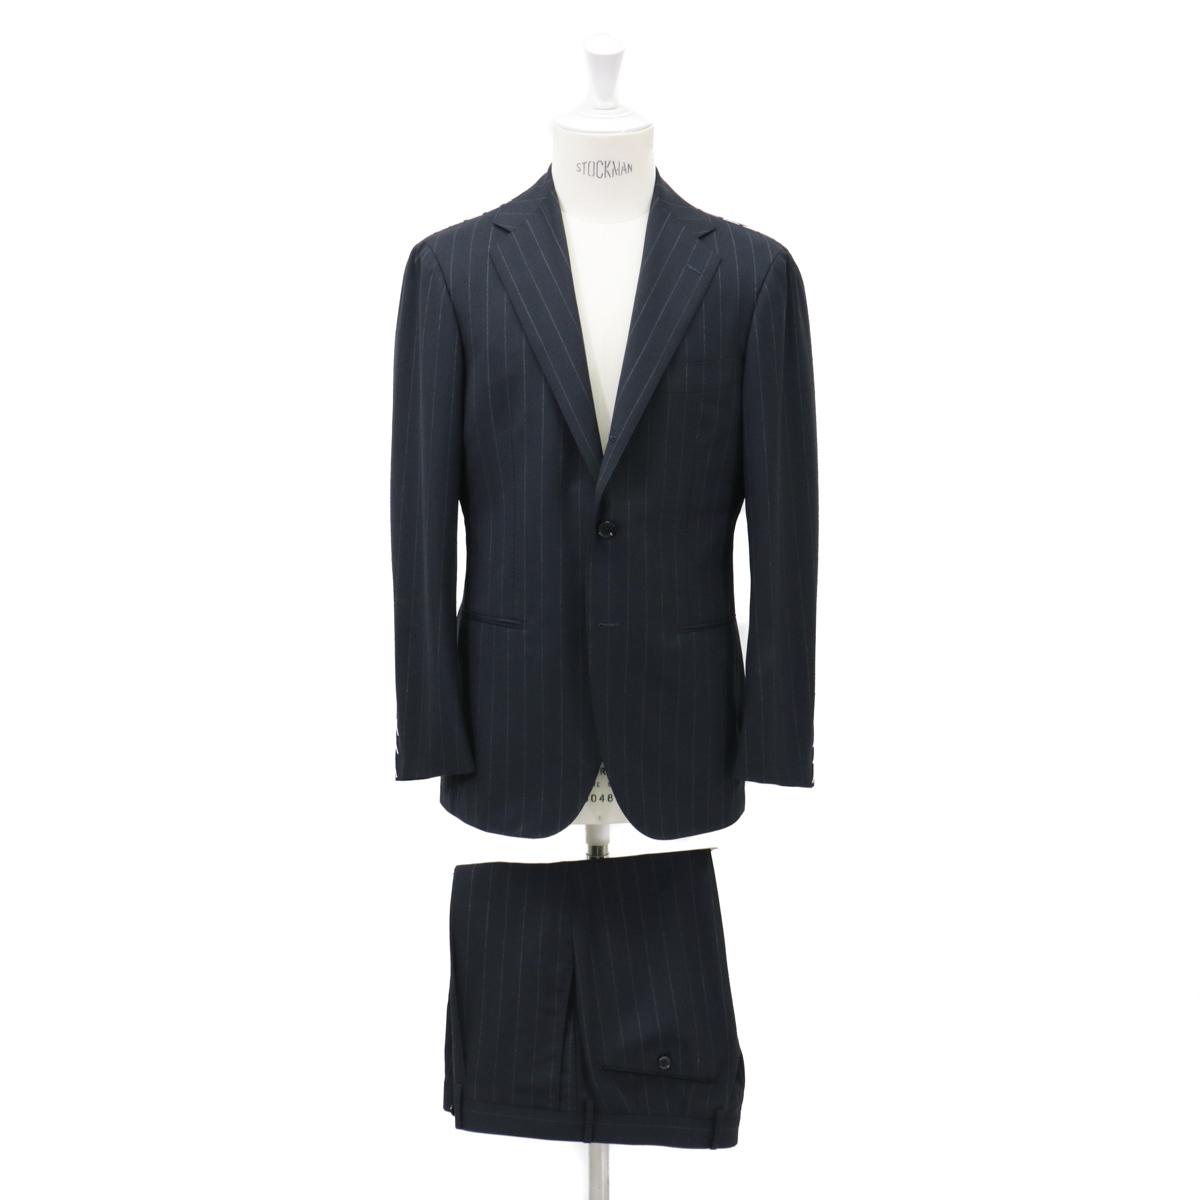 JACKET No-253EH TWIST3Bスーツ【ストライプ・ネイビー】 リングヂャケットModel S-172HHIGH RING